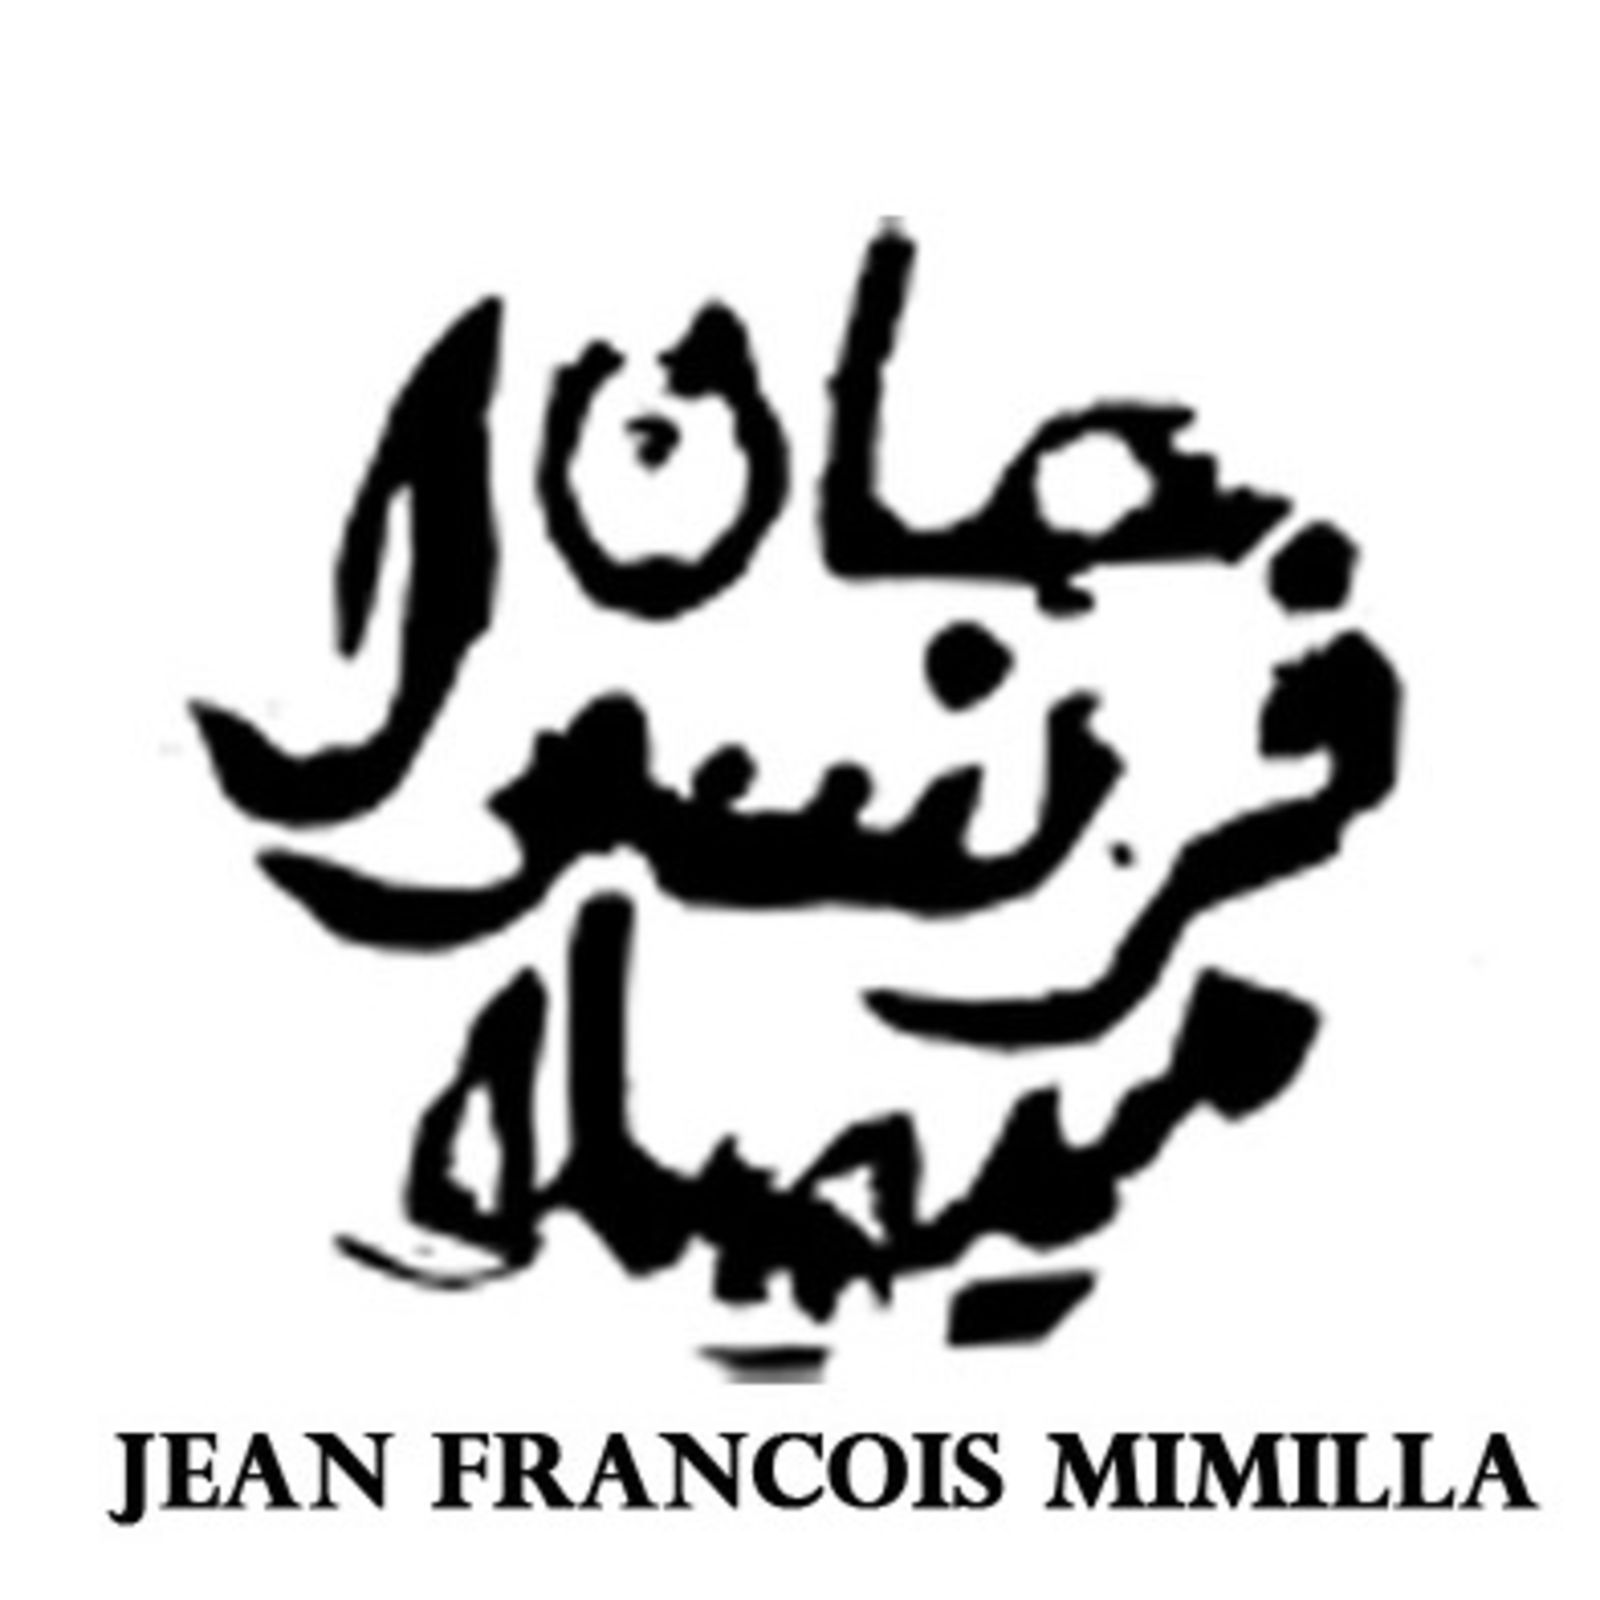 JEAN-FRANÇOIS MIMILLA